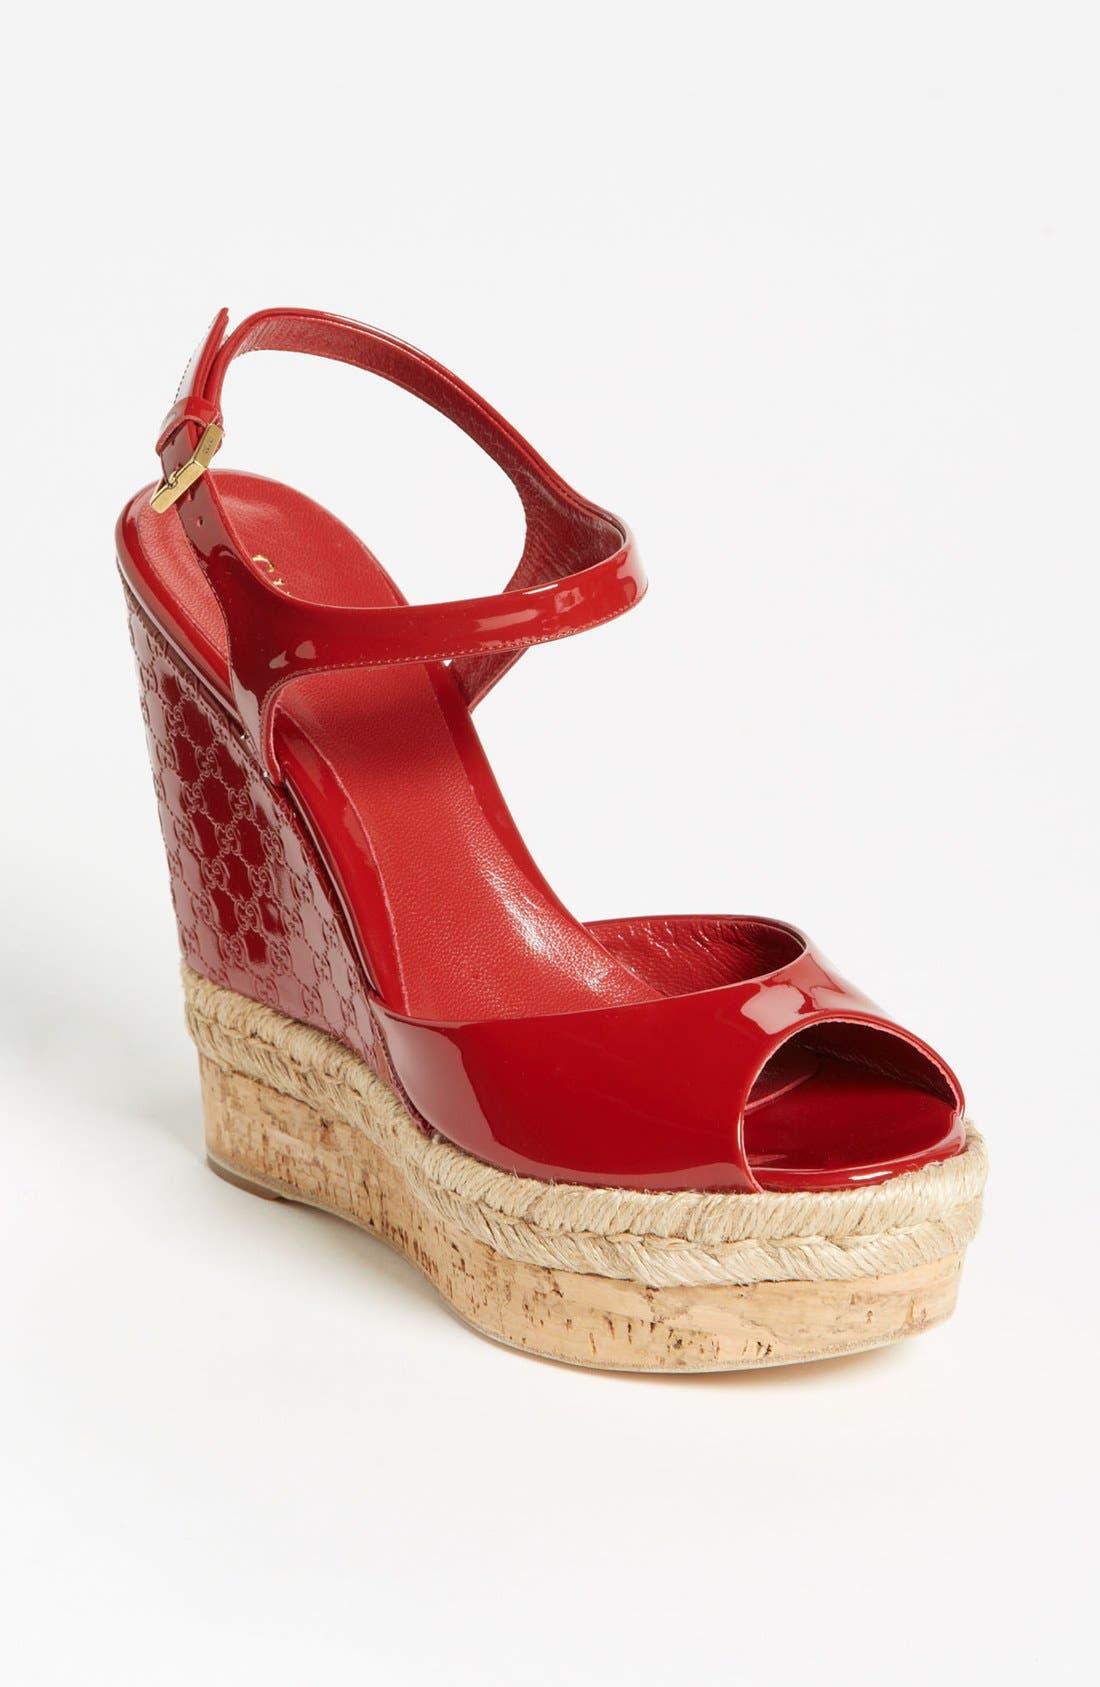 Alternate Image 1 Selected - Gucci 'Hollie' Wedge Sandal